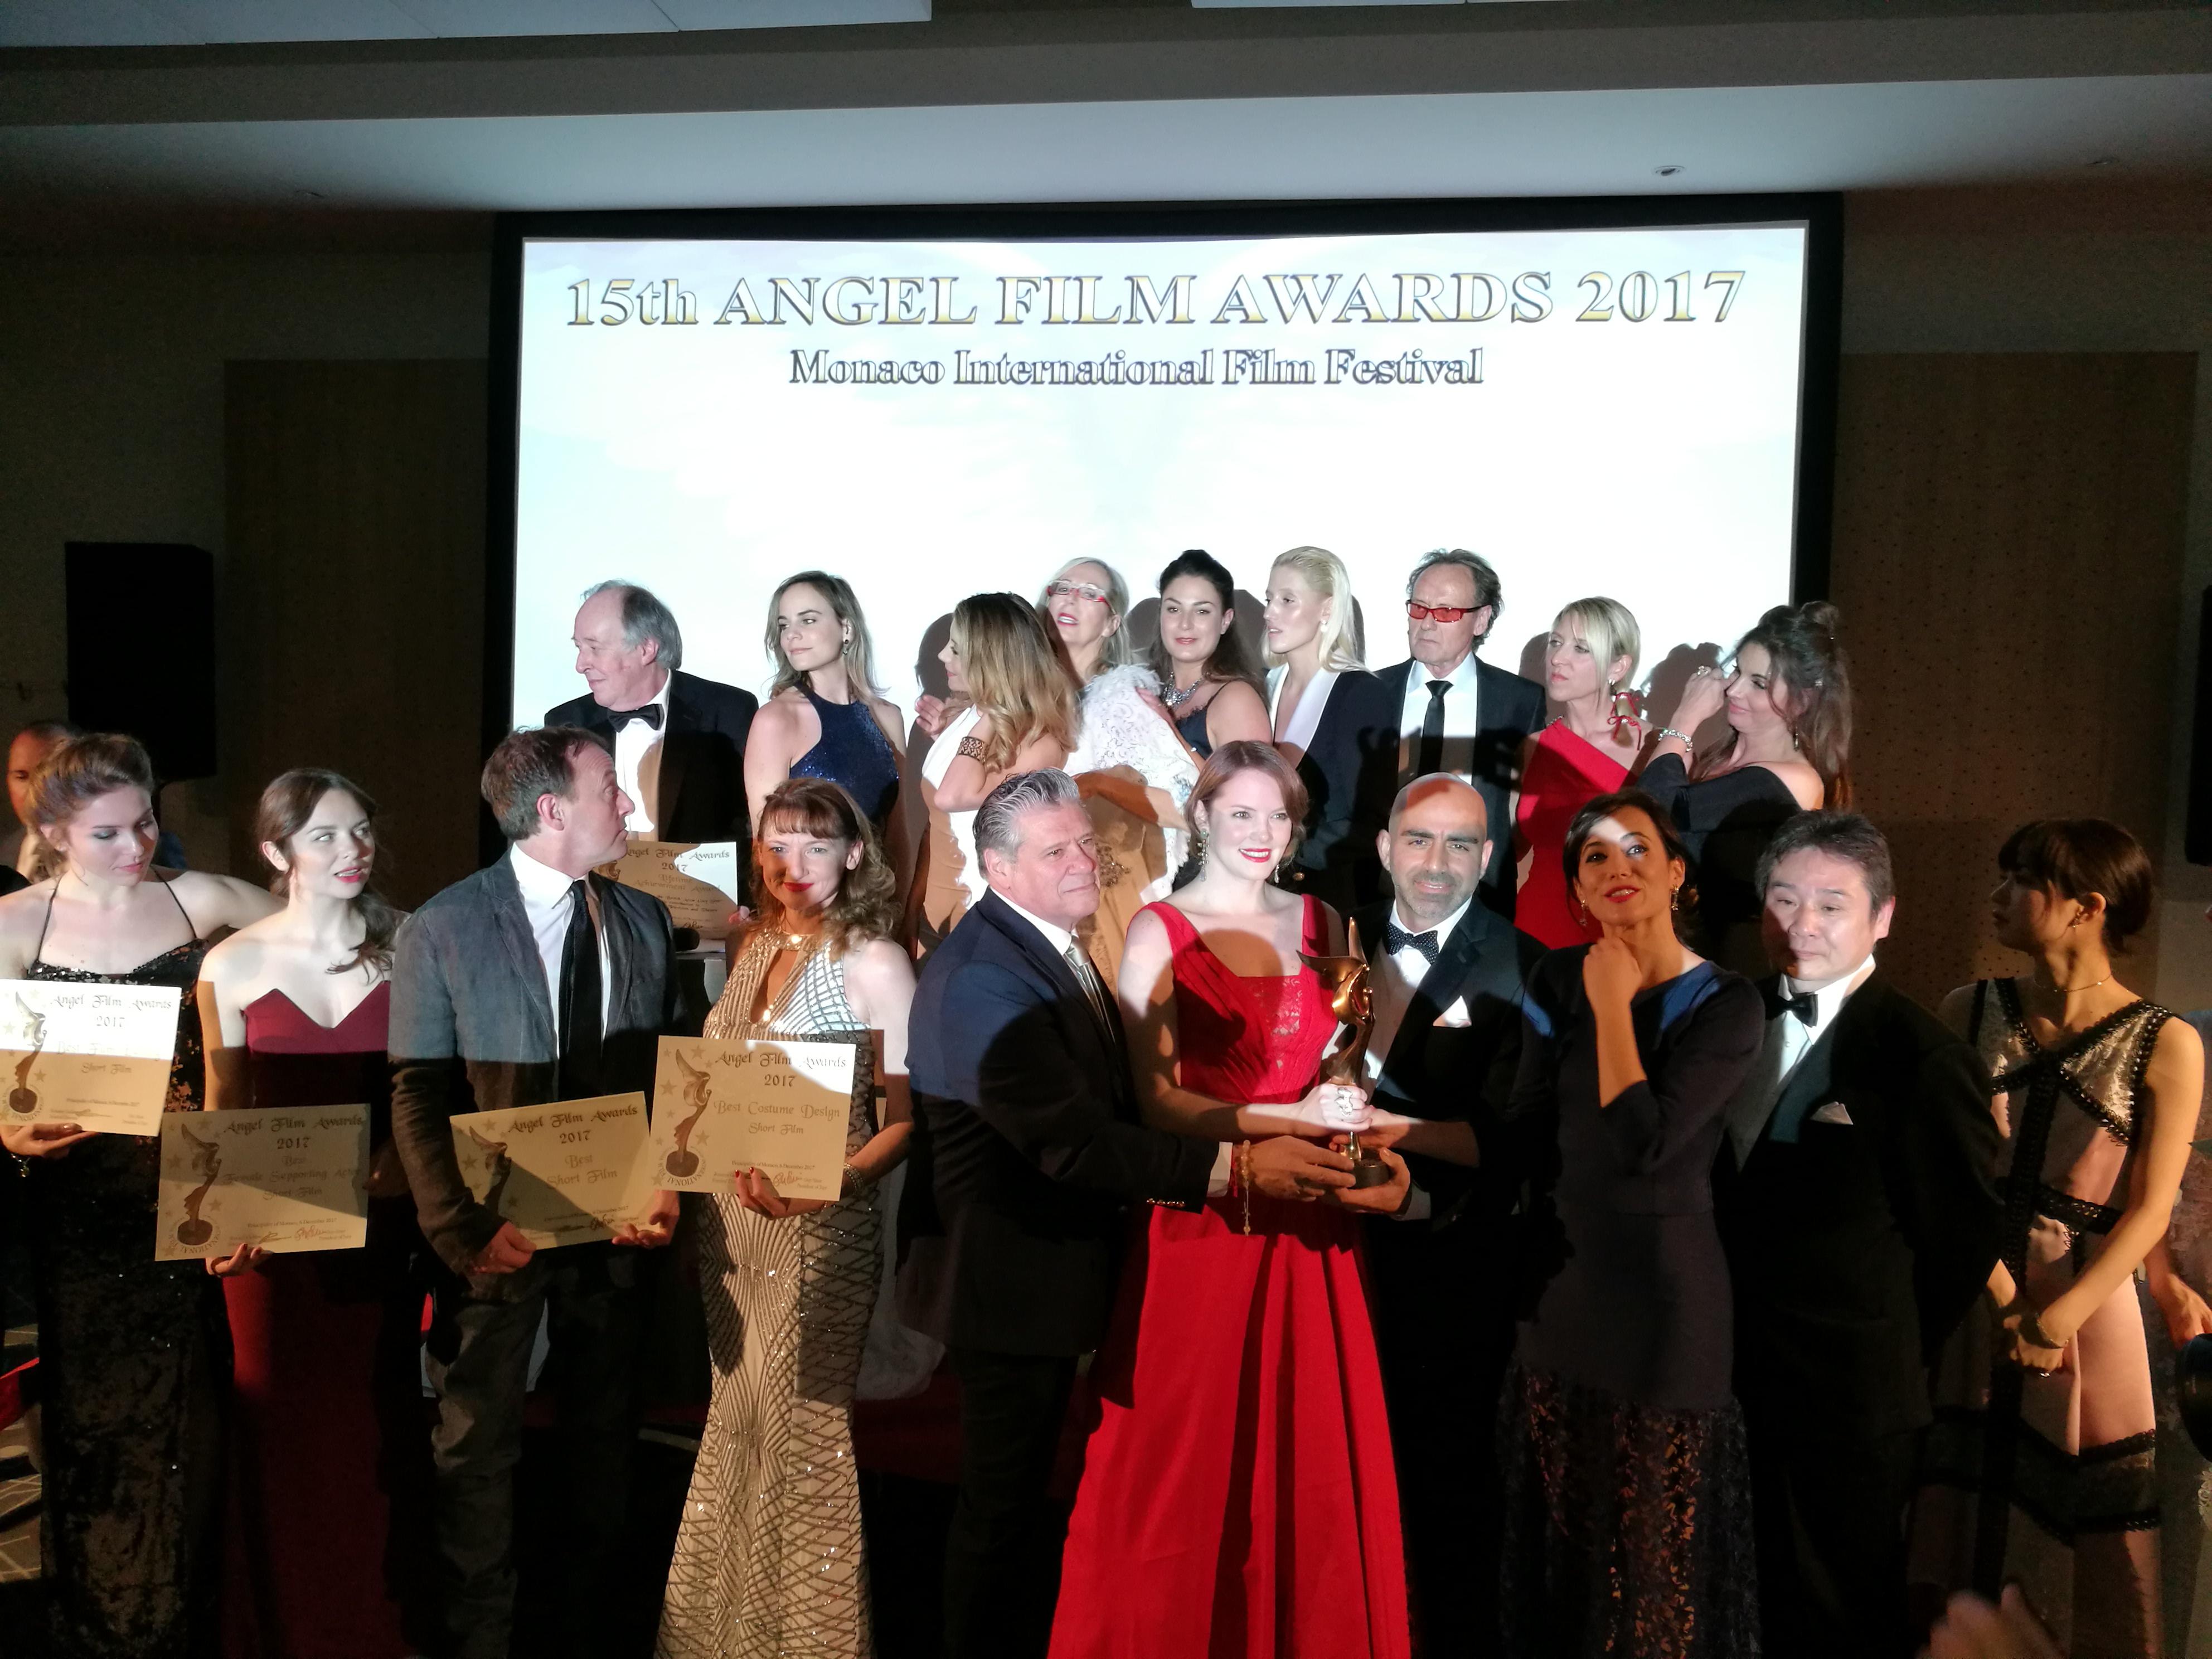 Angel Film Awards 2017 Monaco coverage by Journalism News Network